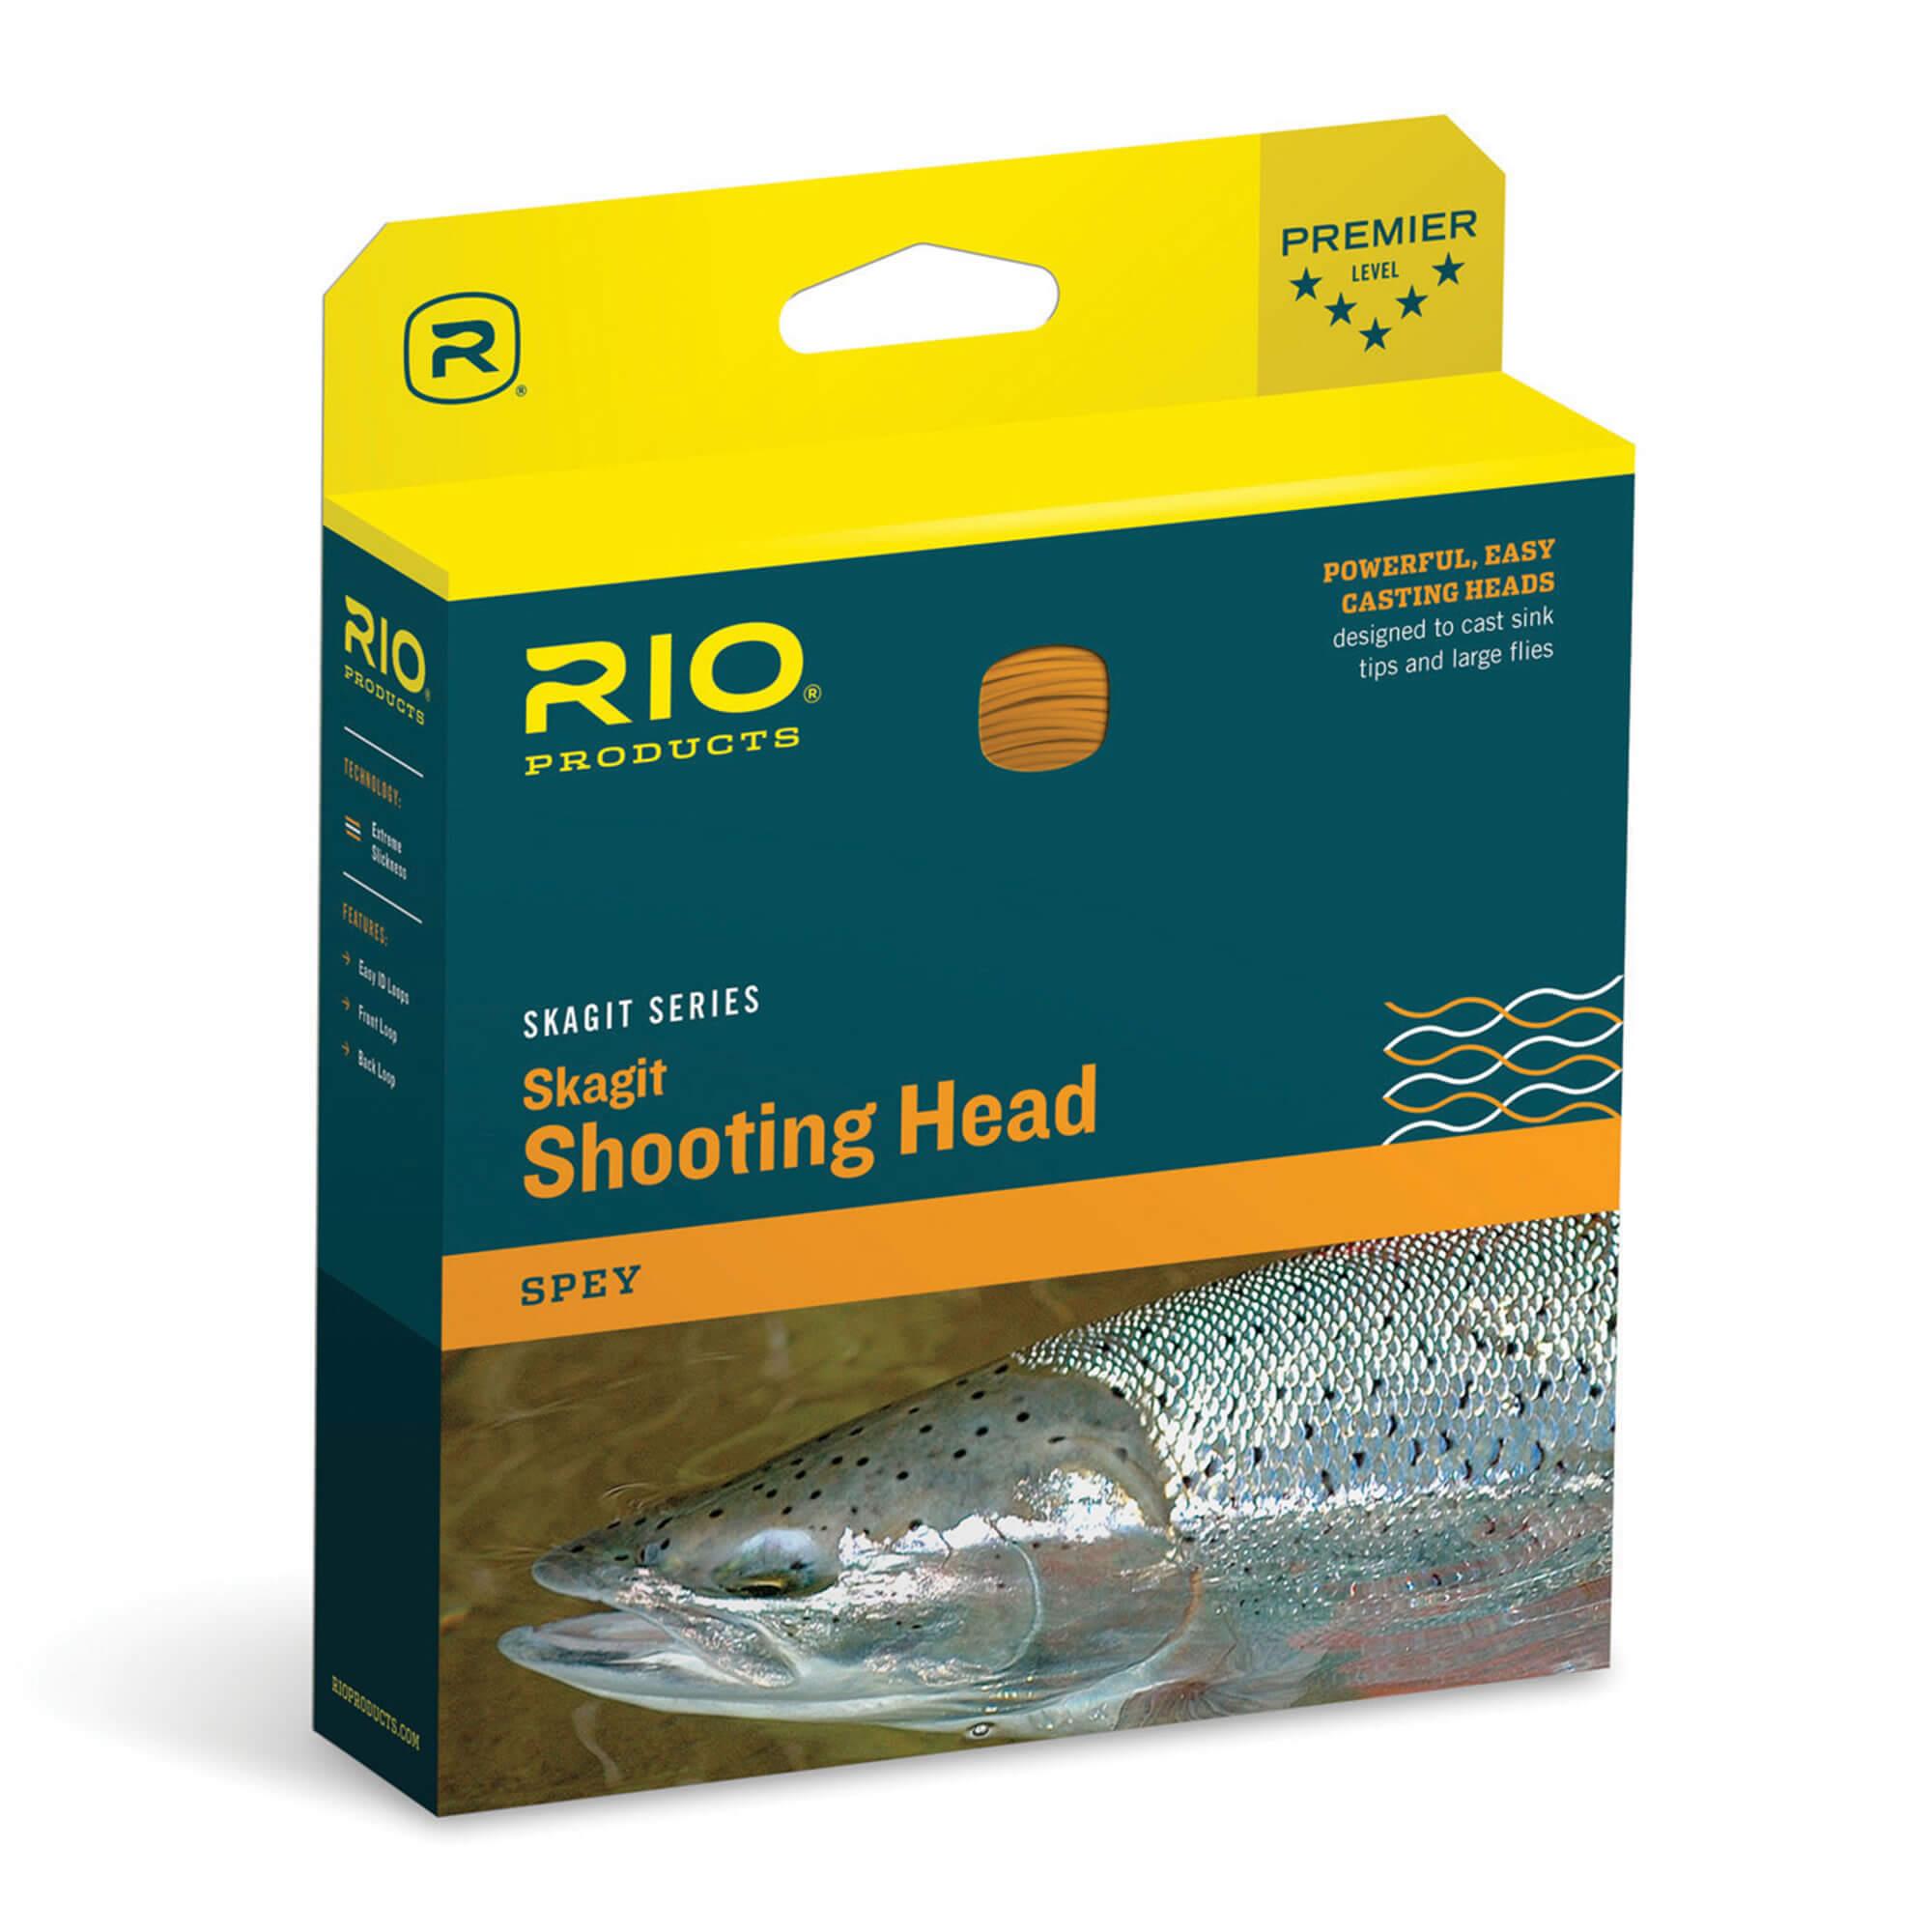 Rio vol Skagit Head 675 Grain 25/' NOUVEAU!